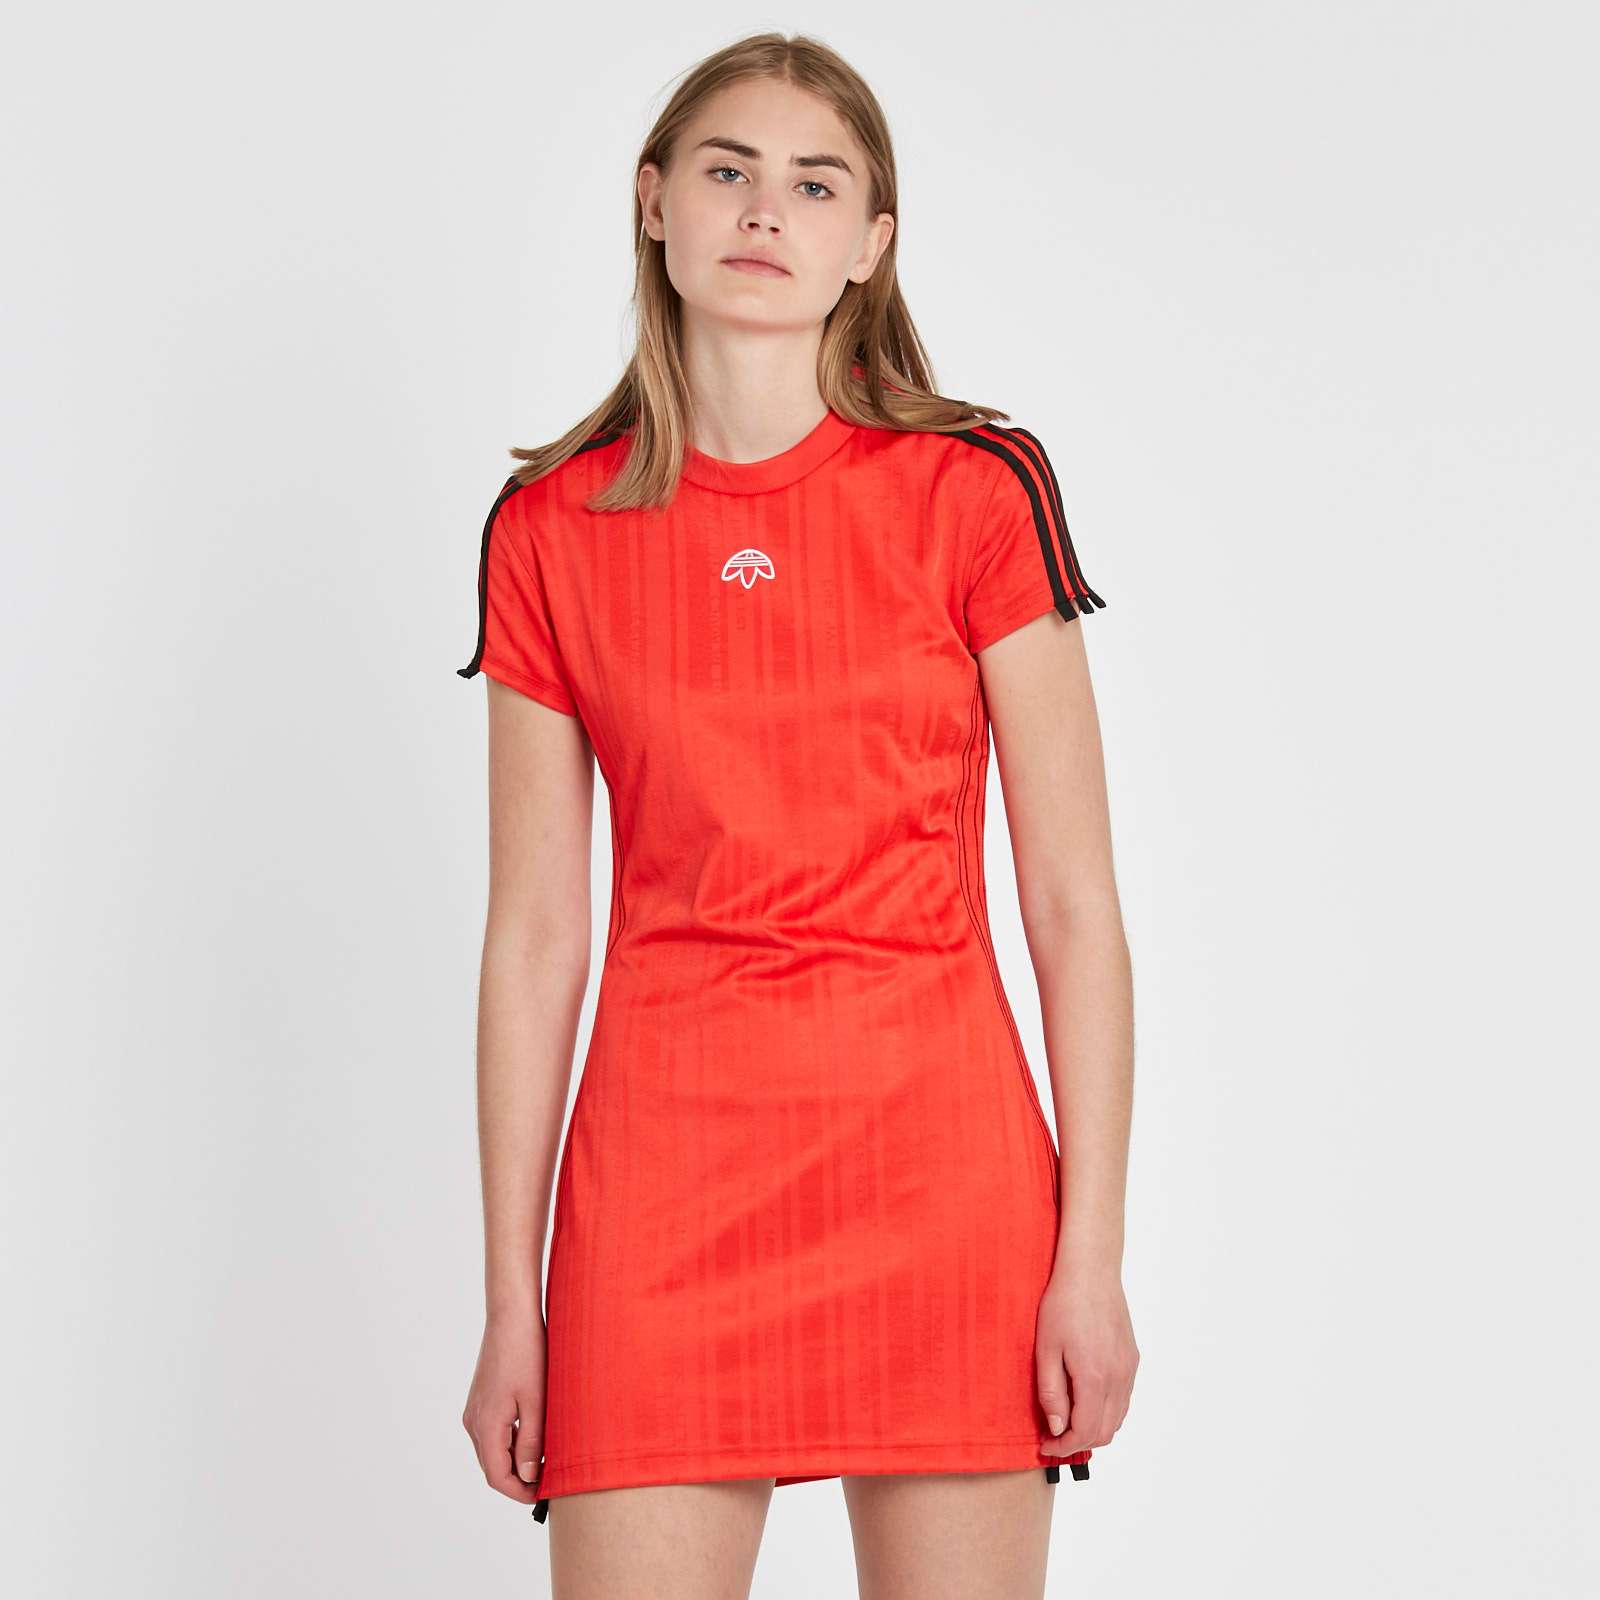 8dfe7f67ef4 adidas Originals by Alexander Wang Dress x Alexander Wang